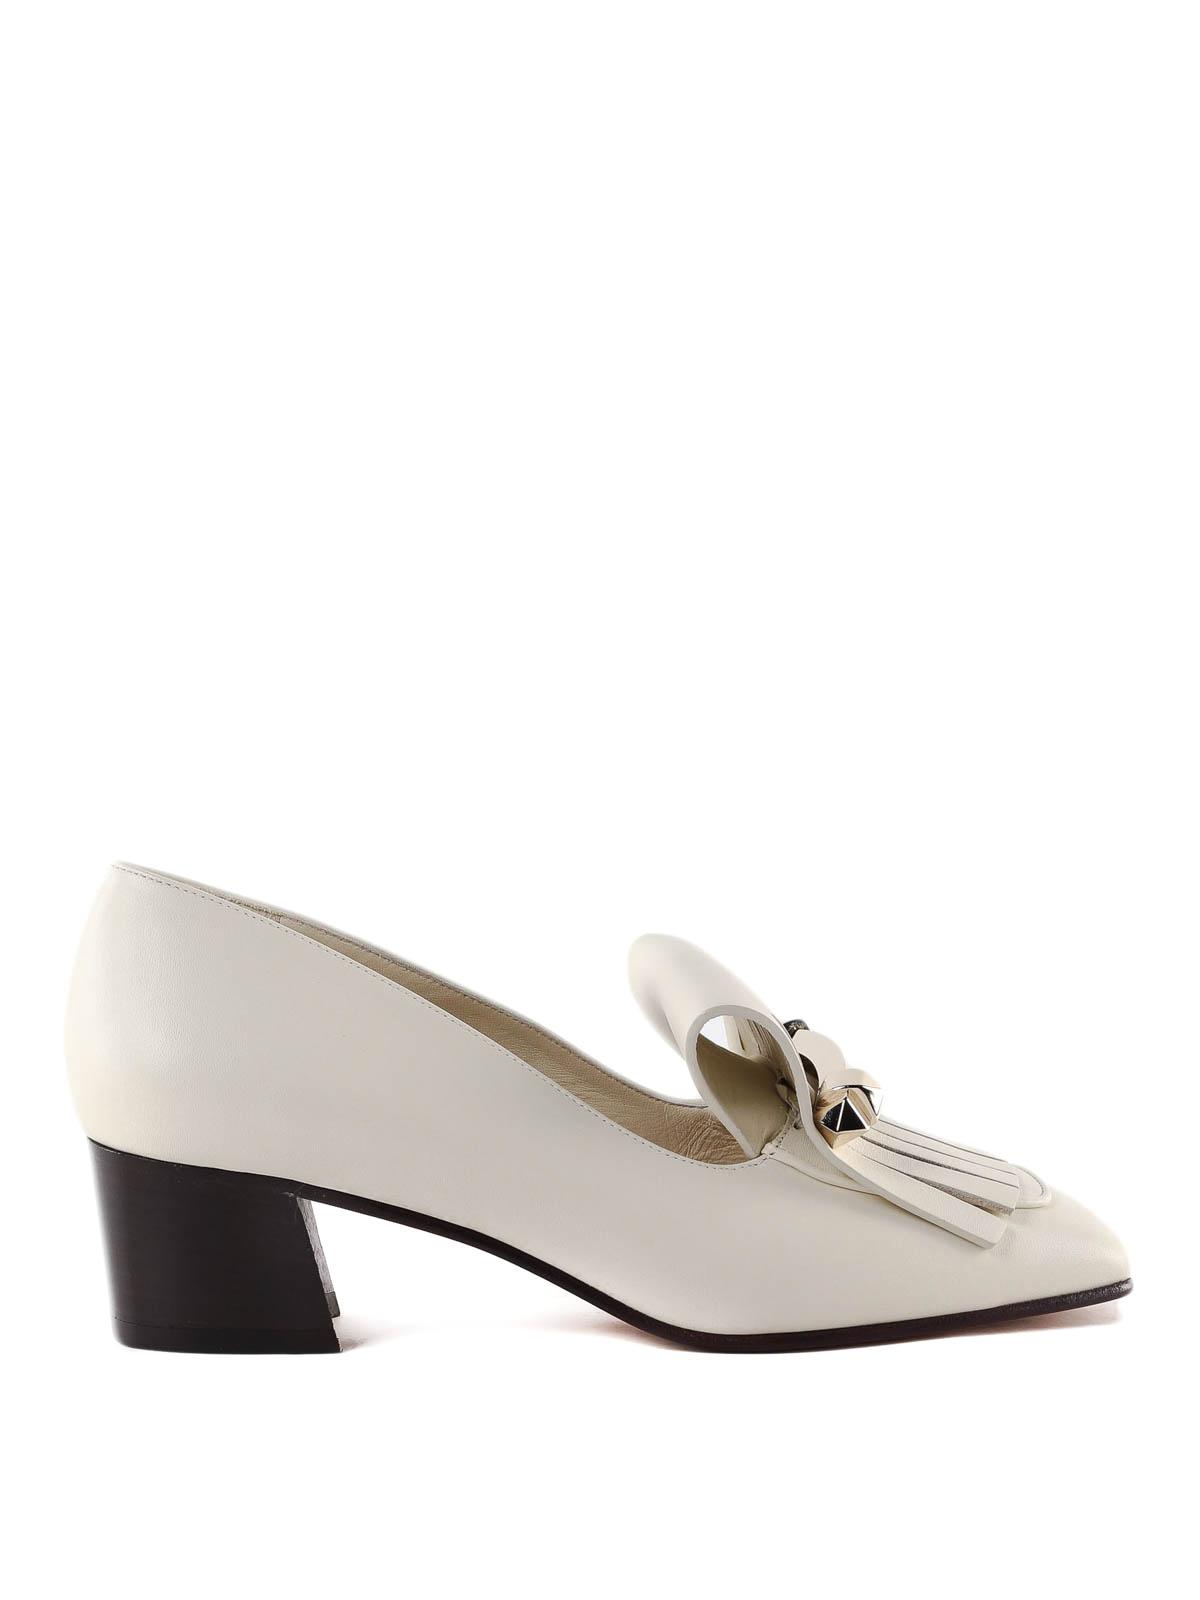 3877b1eeccf cool valentino garavani loafers slippers leather fringed loafers with valentino  slippers